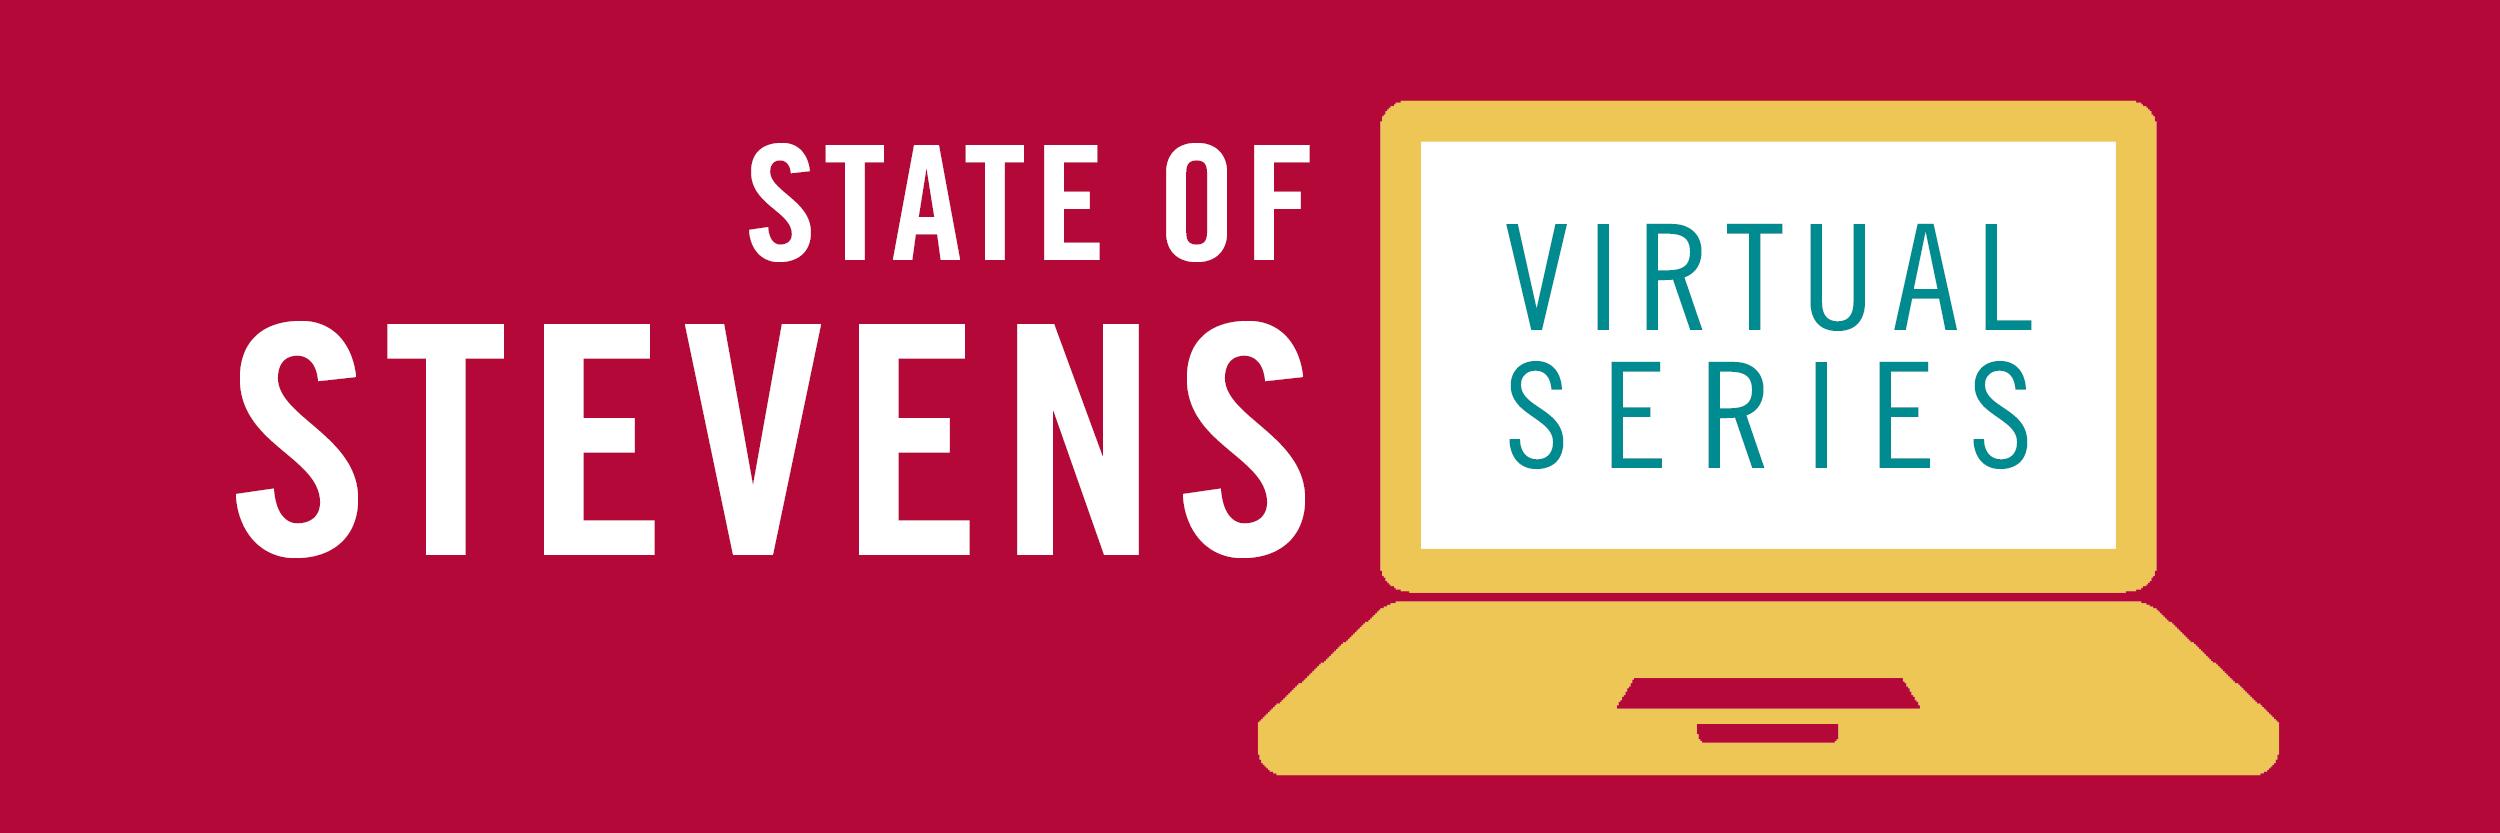 State of Stevens Virtual Series